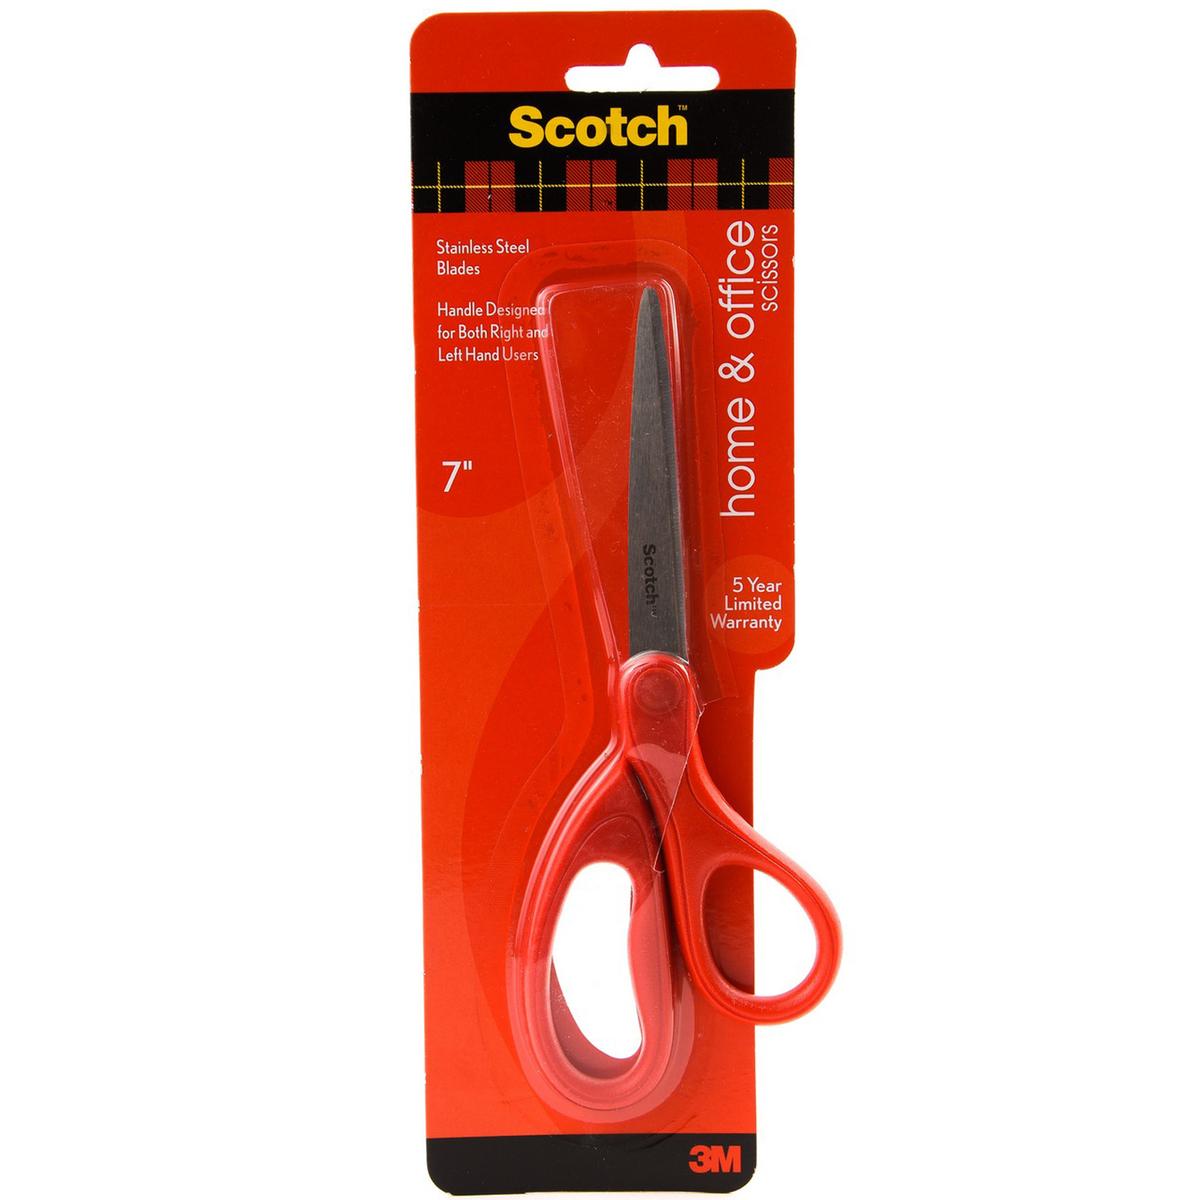 3M Scotch Household Scissor 7inch 1Pc